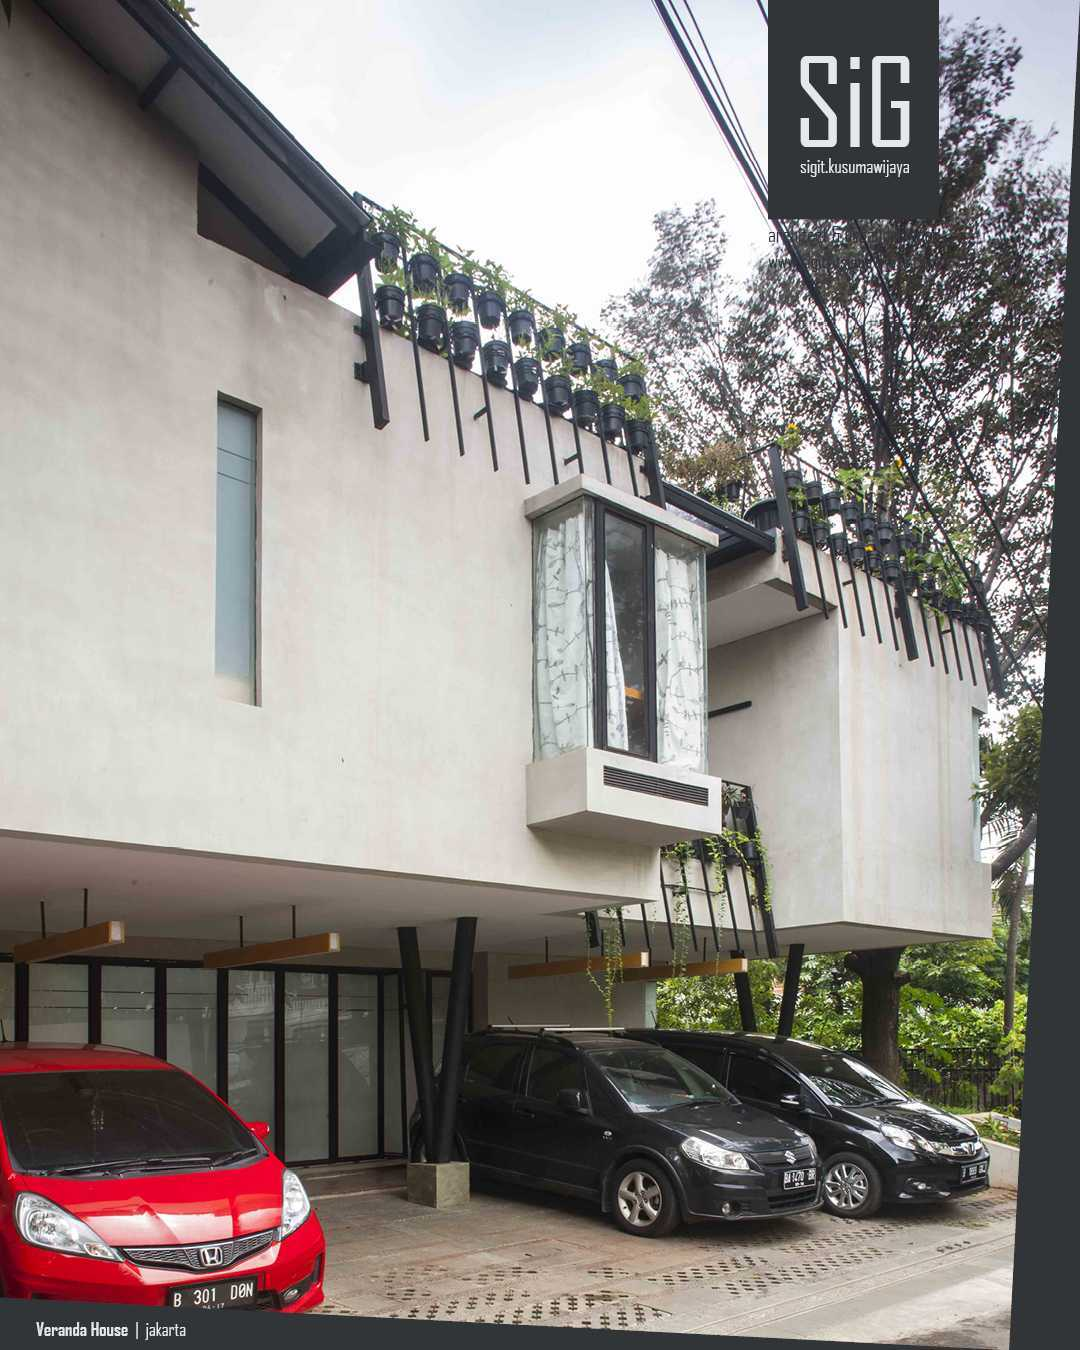 Sigit.kusumawijaya | Architect & Urbandesigner Rumah Beranda - Green Boarding House Cipete, South Jakarta, Indonesia Cipete, South Jakarta, Indonesia Sigitkusumawijaya-Architect-Urbandesigner-Rumah-Beranda-Green-Boarding-House Industrial 55007